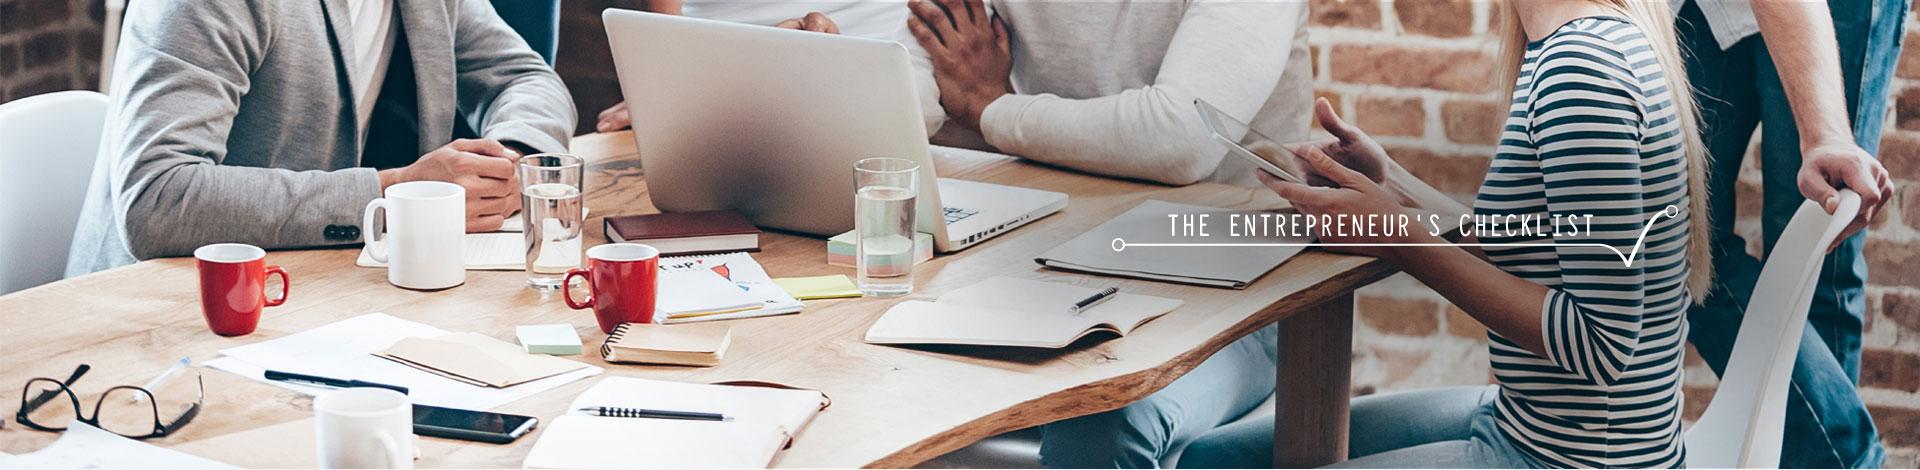 The Entrepreneur's Checklist